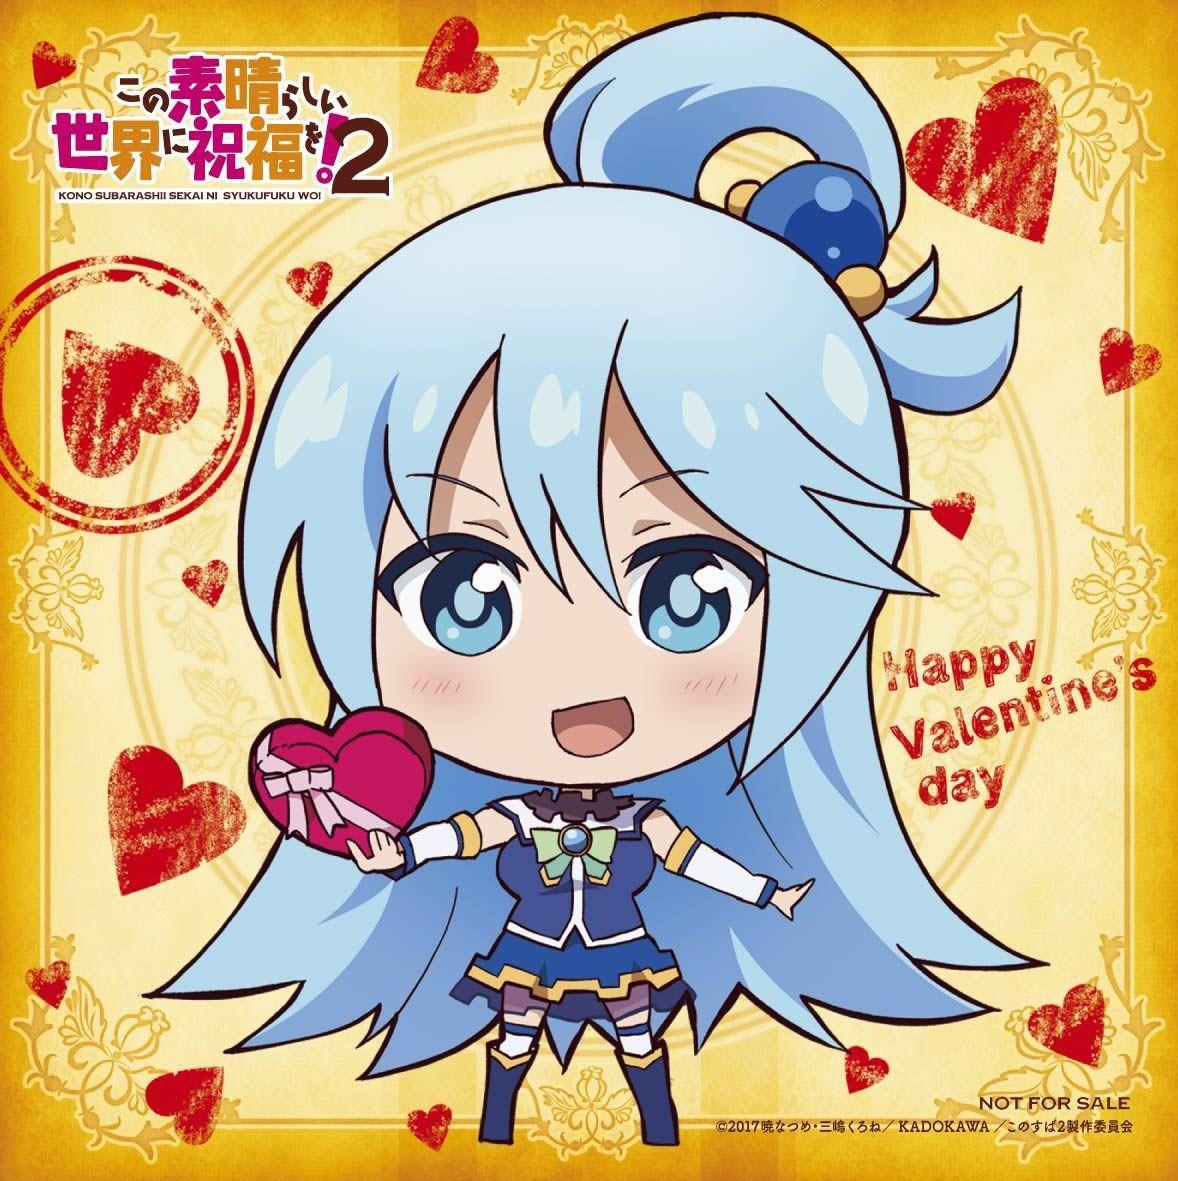 KonoSuba girls get ready for Valentine's Day in new collaboration - http://sgcafe.com/2017/02/konosuba-girls-get-ready-valentines-day-new-collaboration/